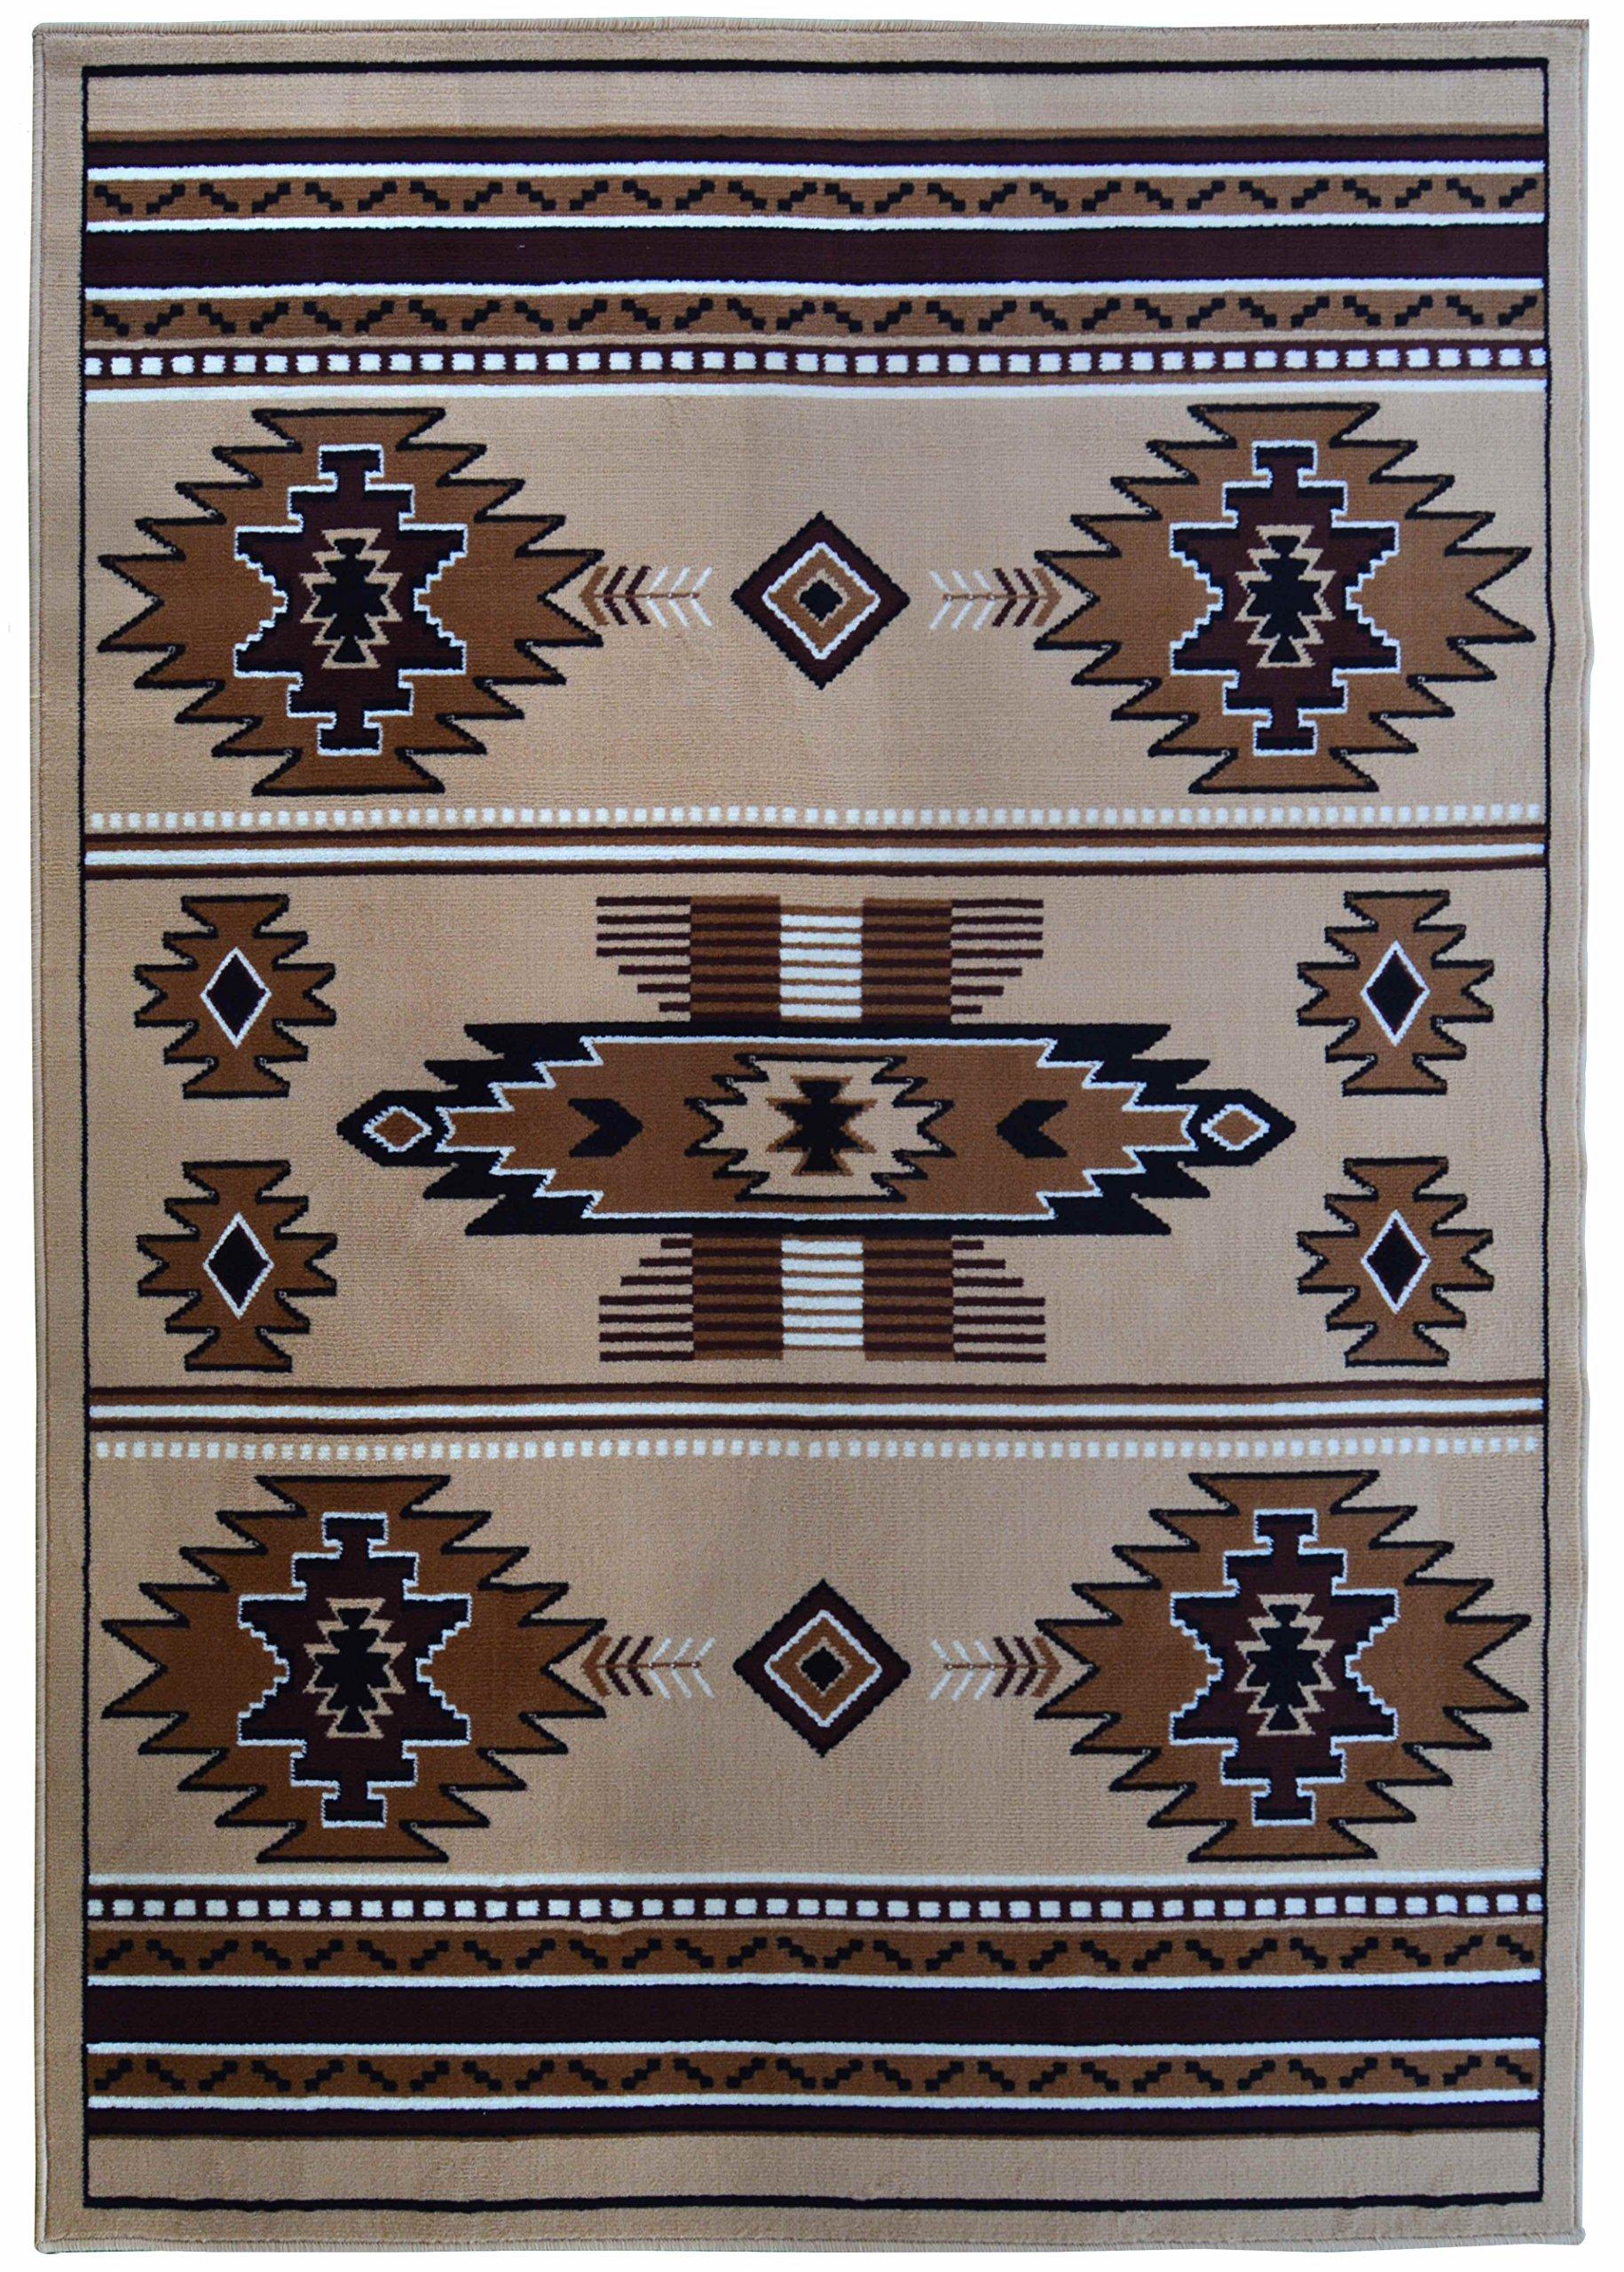 rugs 4 less collection southwest native american indian area rug design r4l s. Black Bedroom Furniture Sets. Home Design Ideas